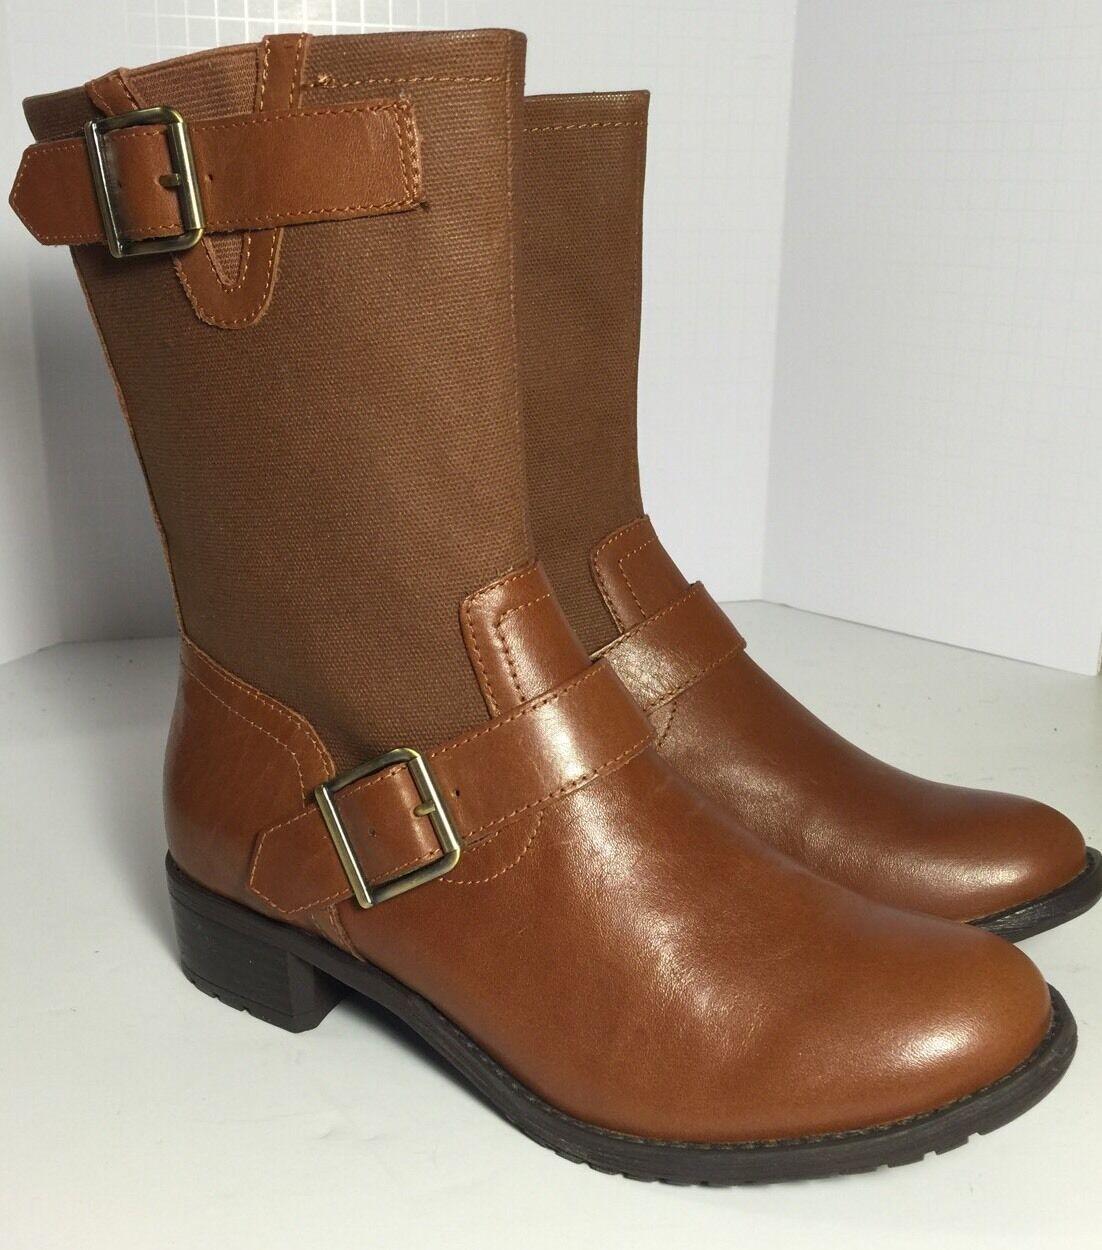 NEU Puppies LOLA Chamber Tan Leder Ankle Stiefel Größe 5.5 EU 36.5 Waterproof